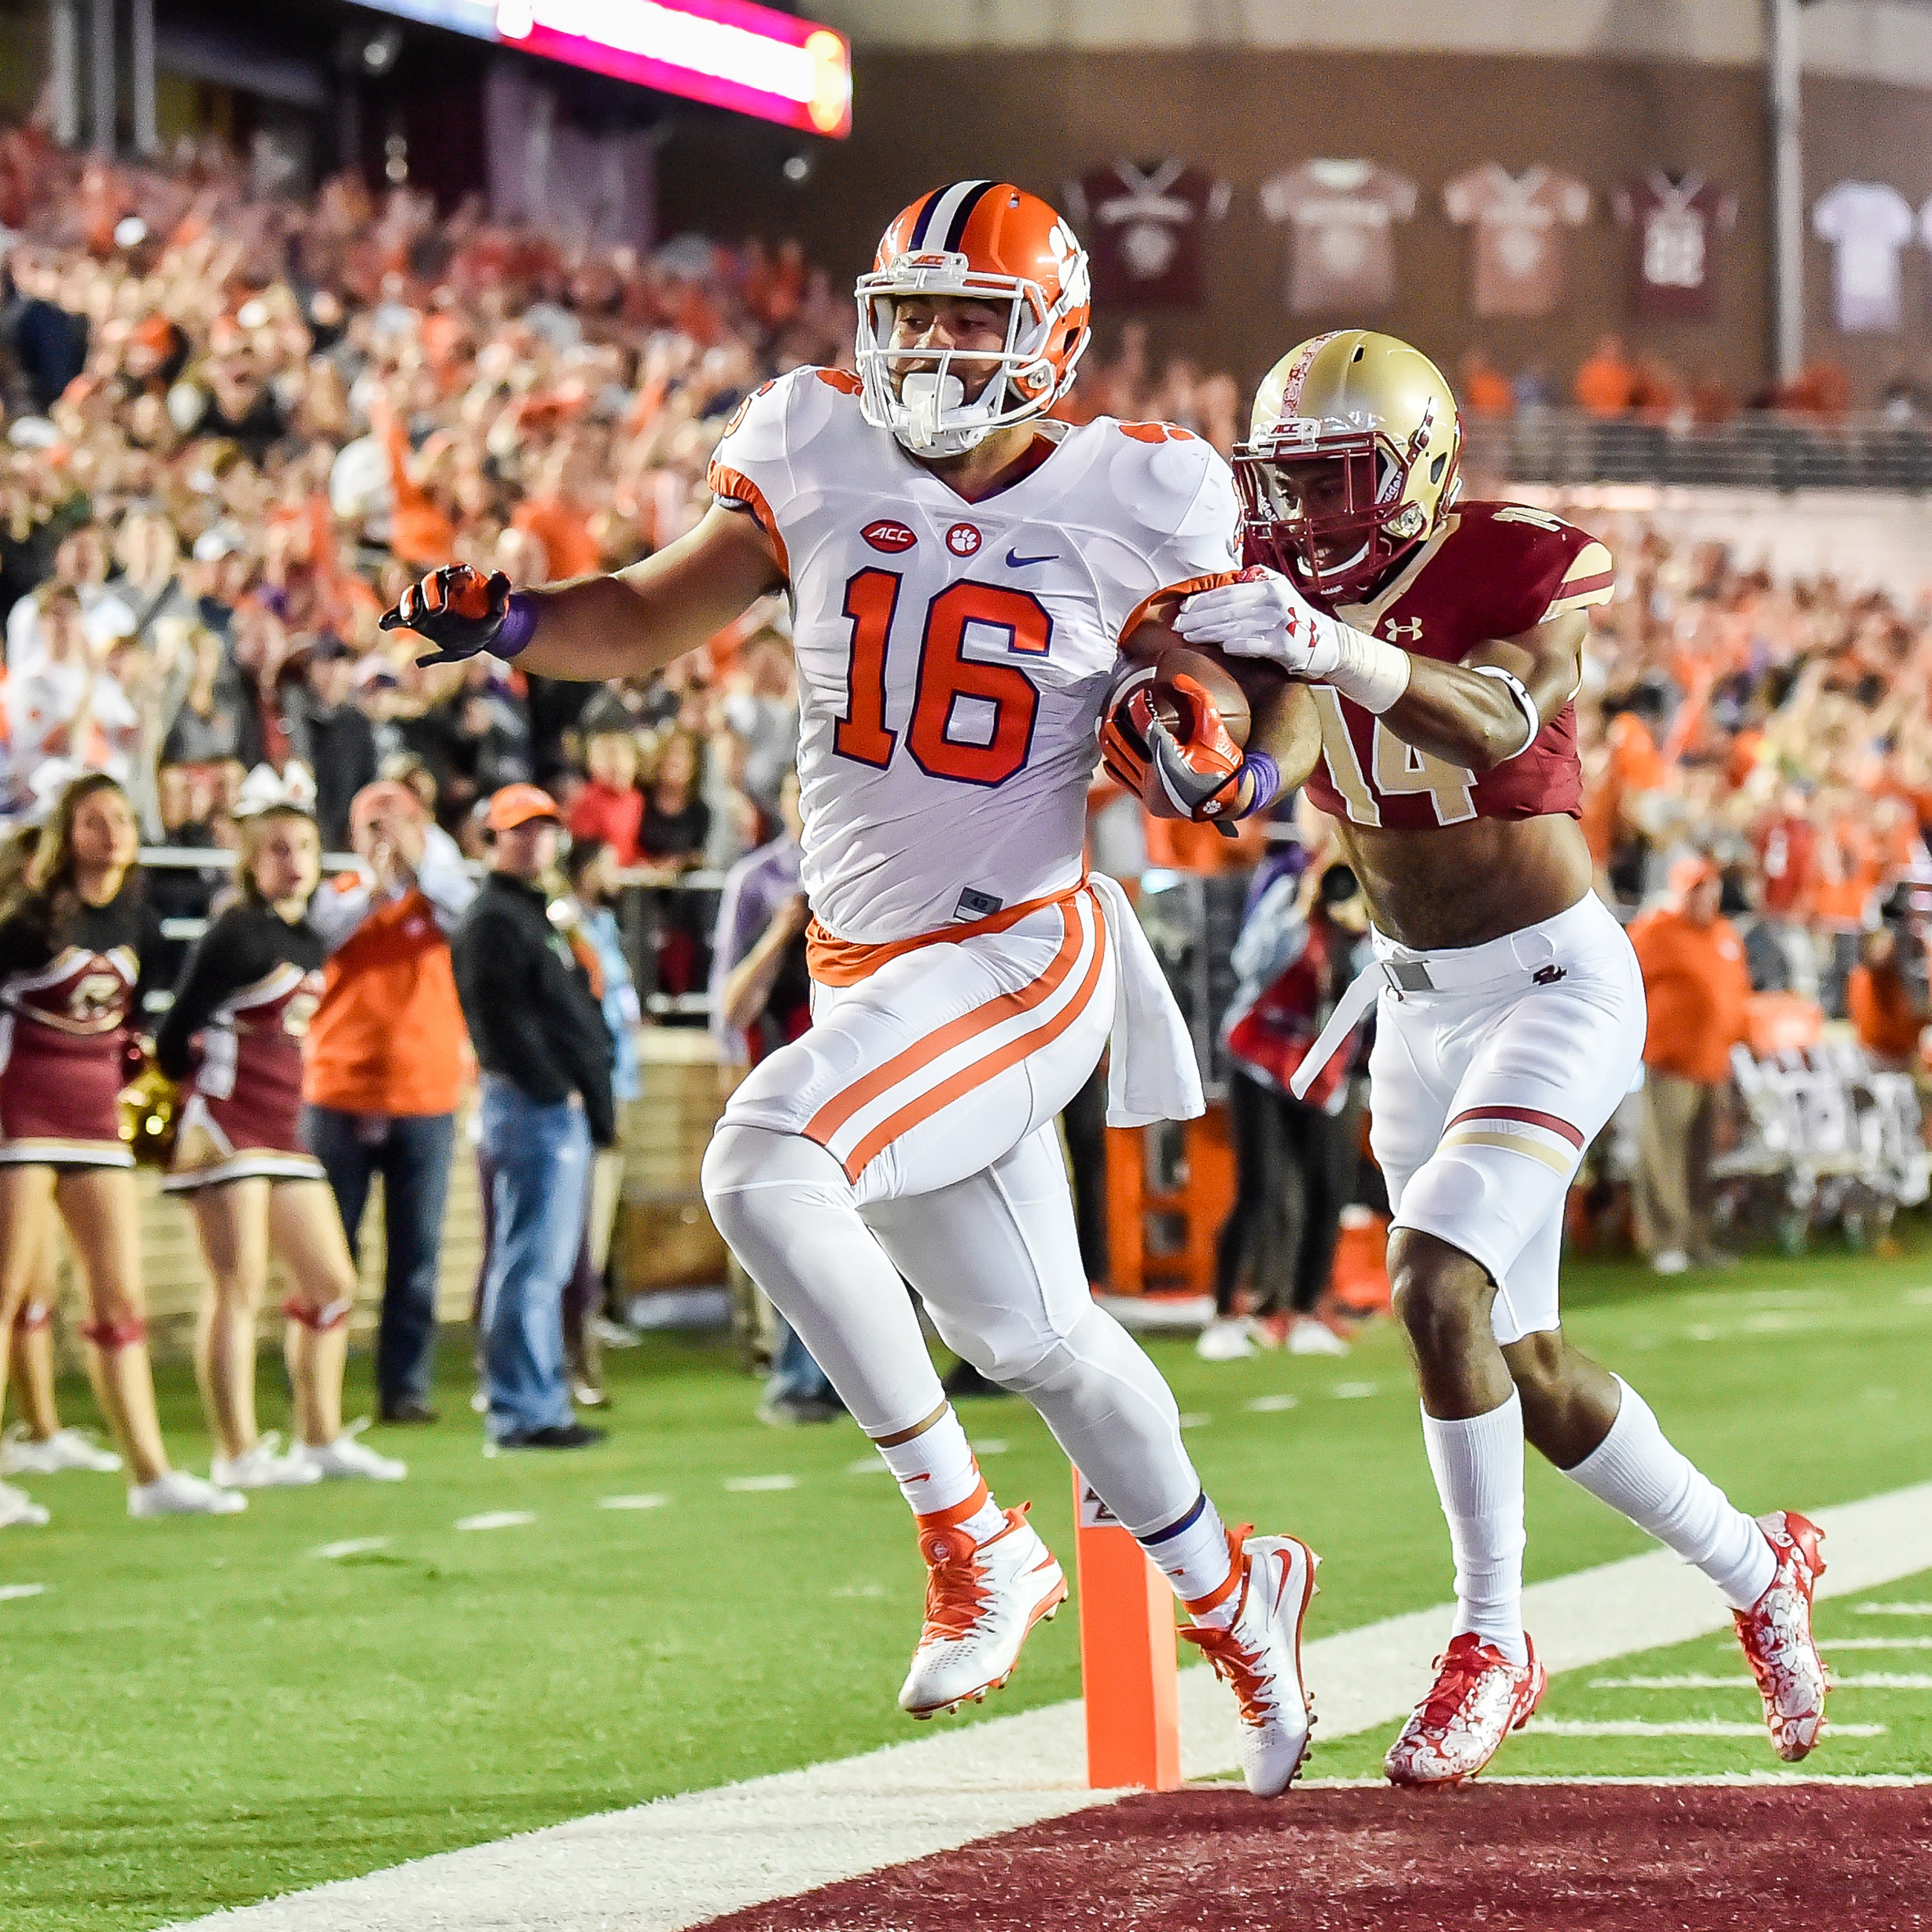 Draft Watch: Jordan Leggett